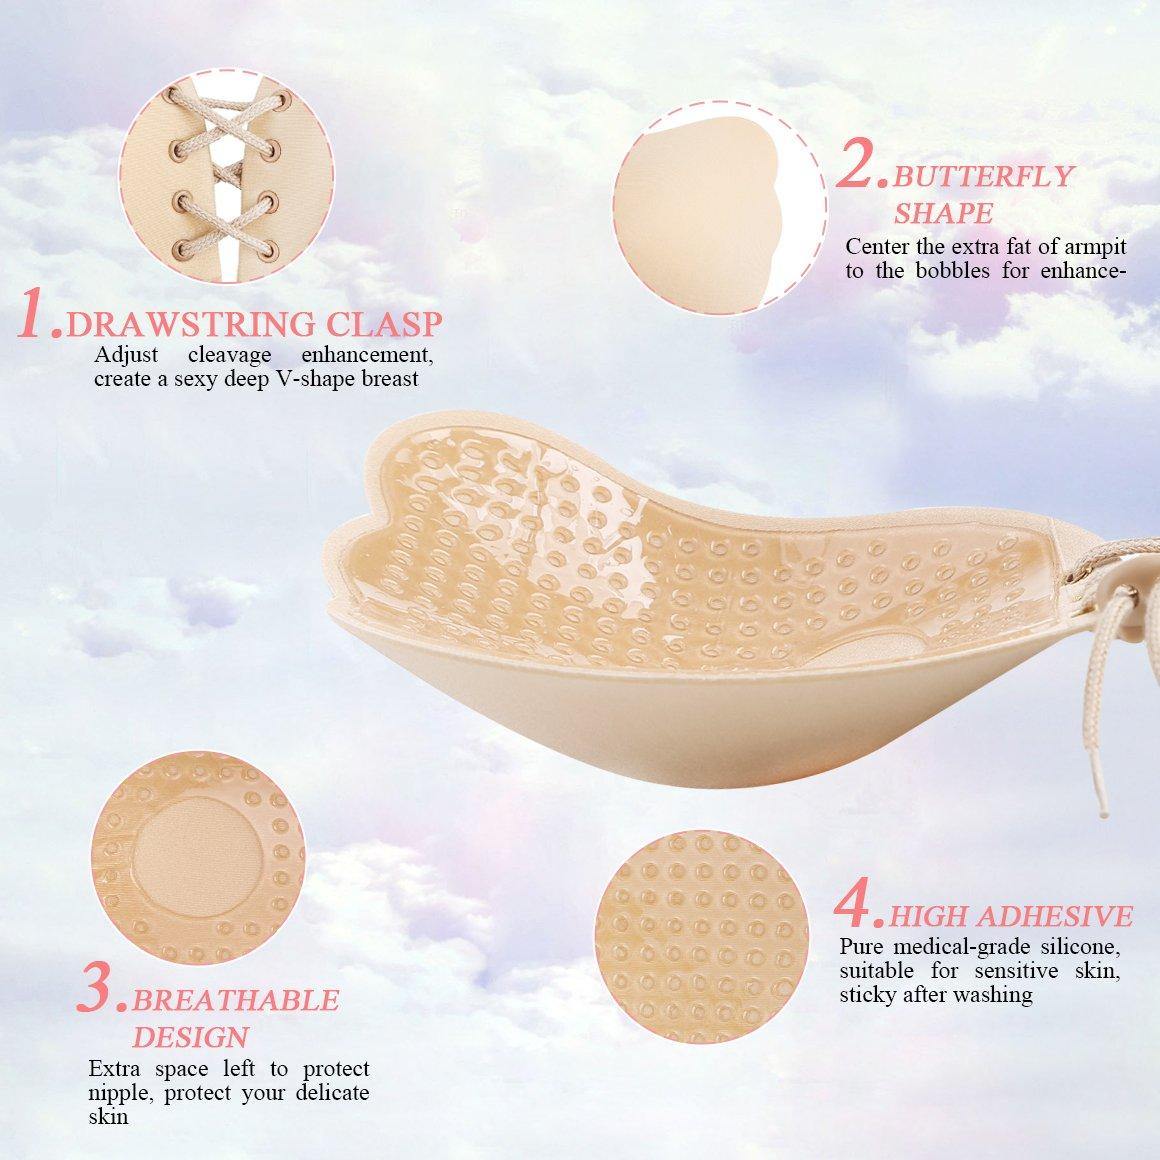 8ebaba790e Adhesive Invisible Bra Sticky Strapless Silicone Bra for Women